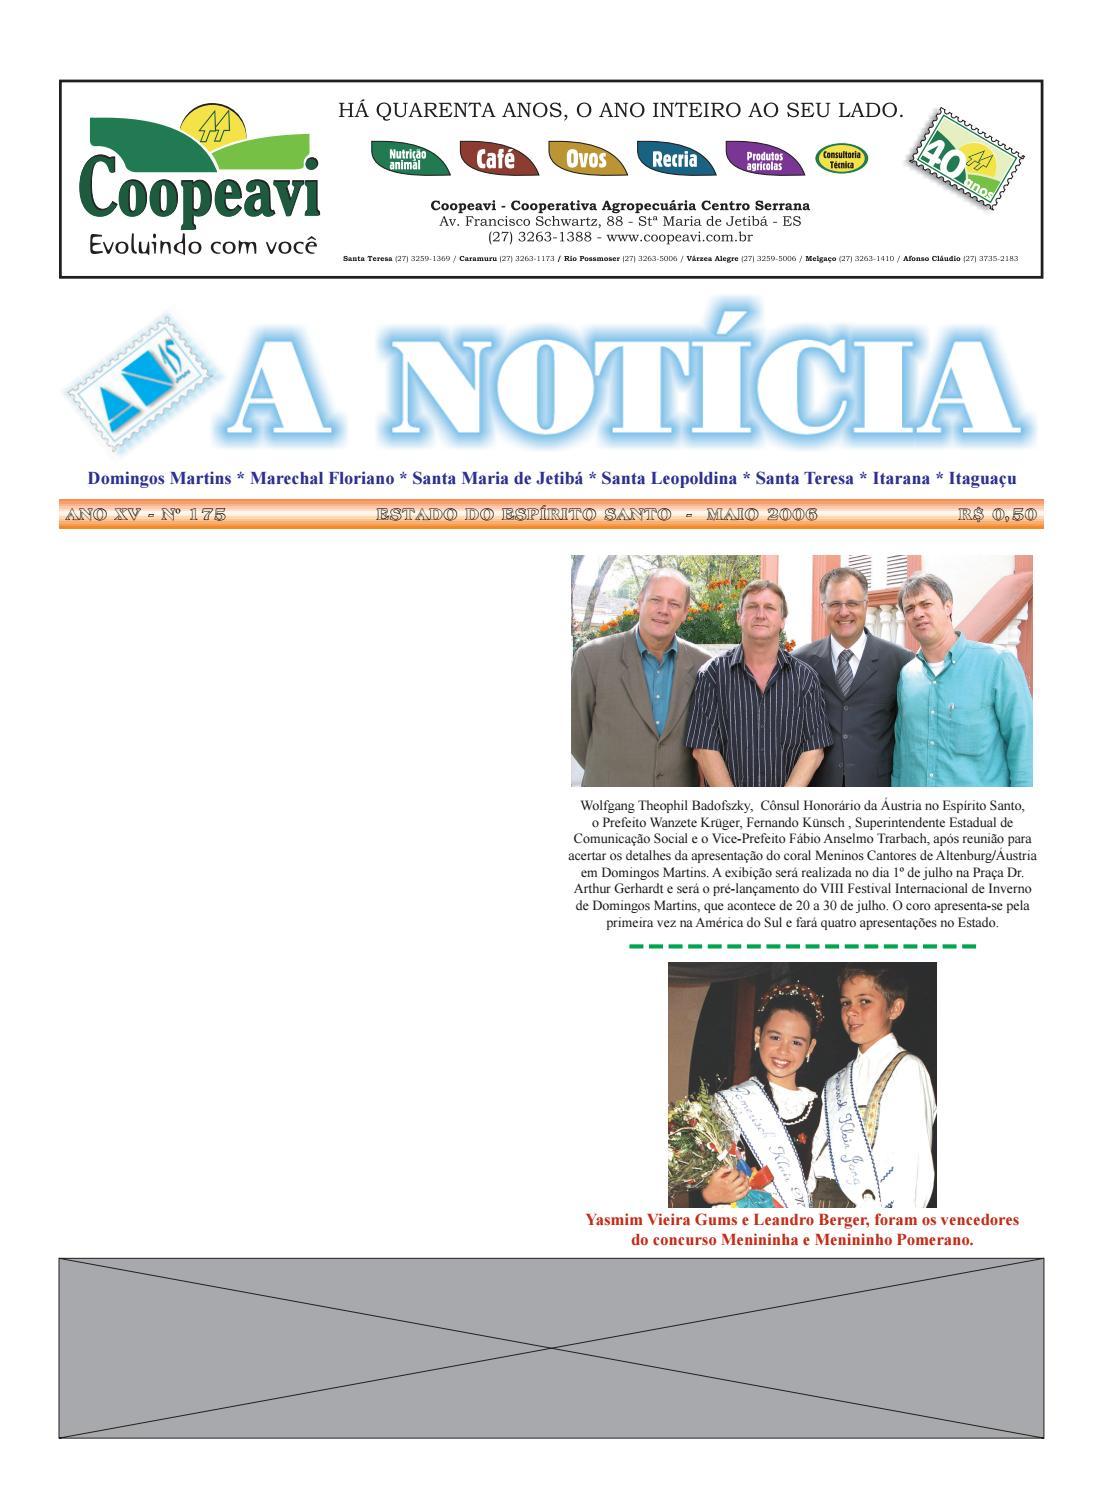 2d2dfc635f7 Jornal A Notícia - Edição 175 - Maio 2006 by Jornal Nova Notícia - issuu